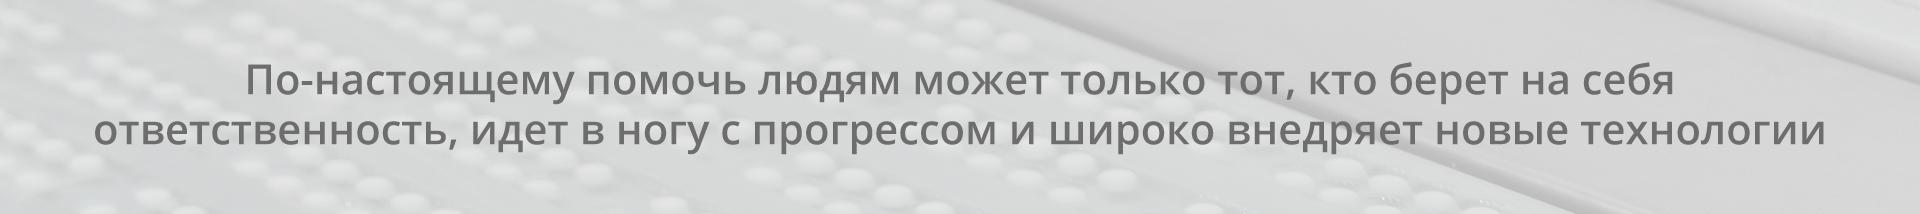 Banner_Microhim_5